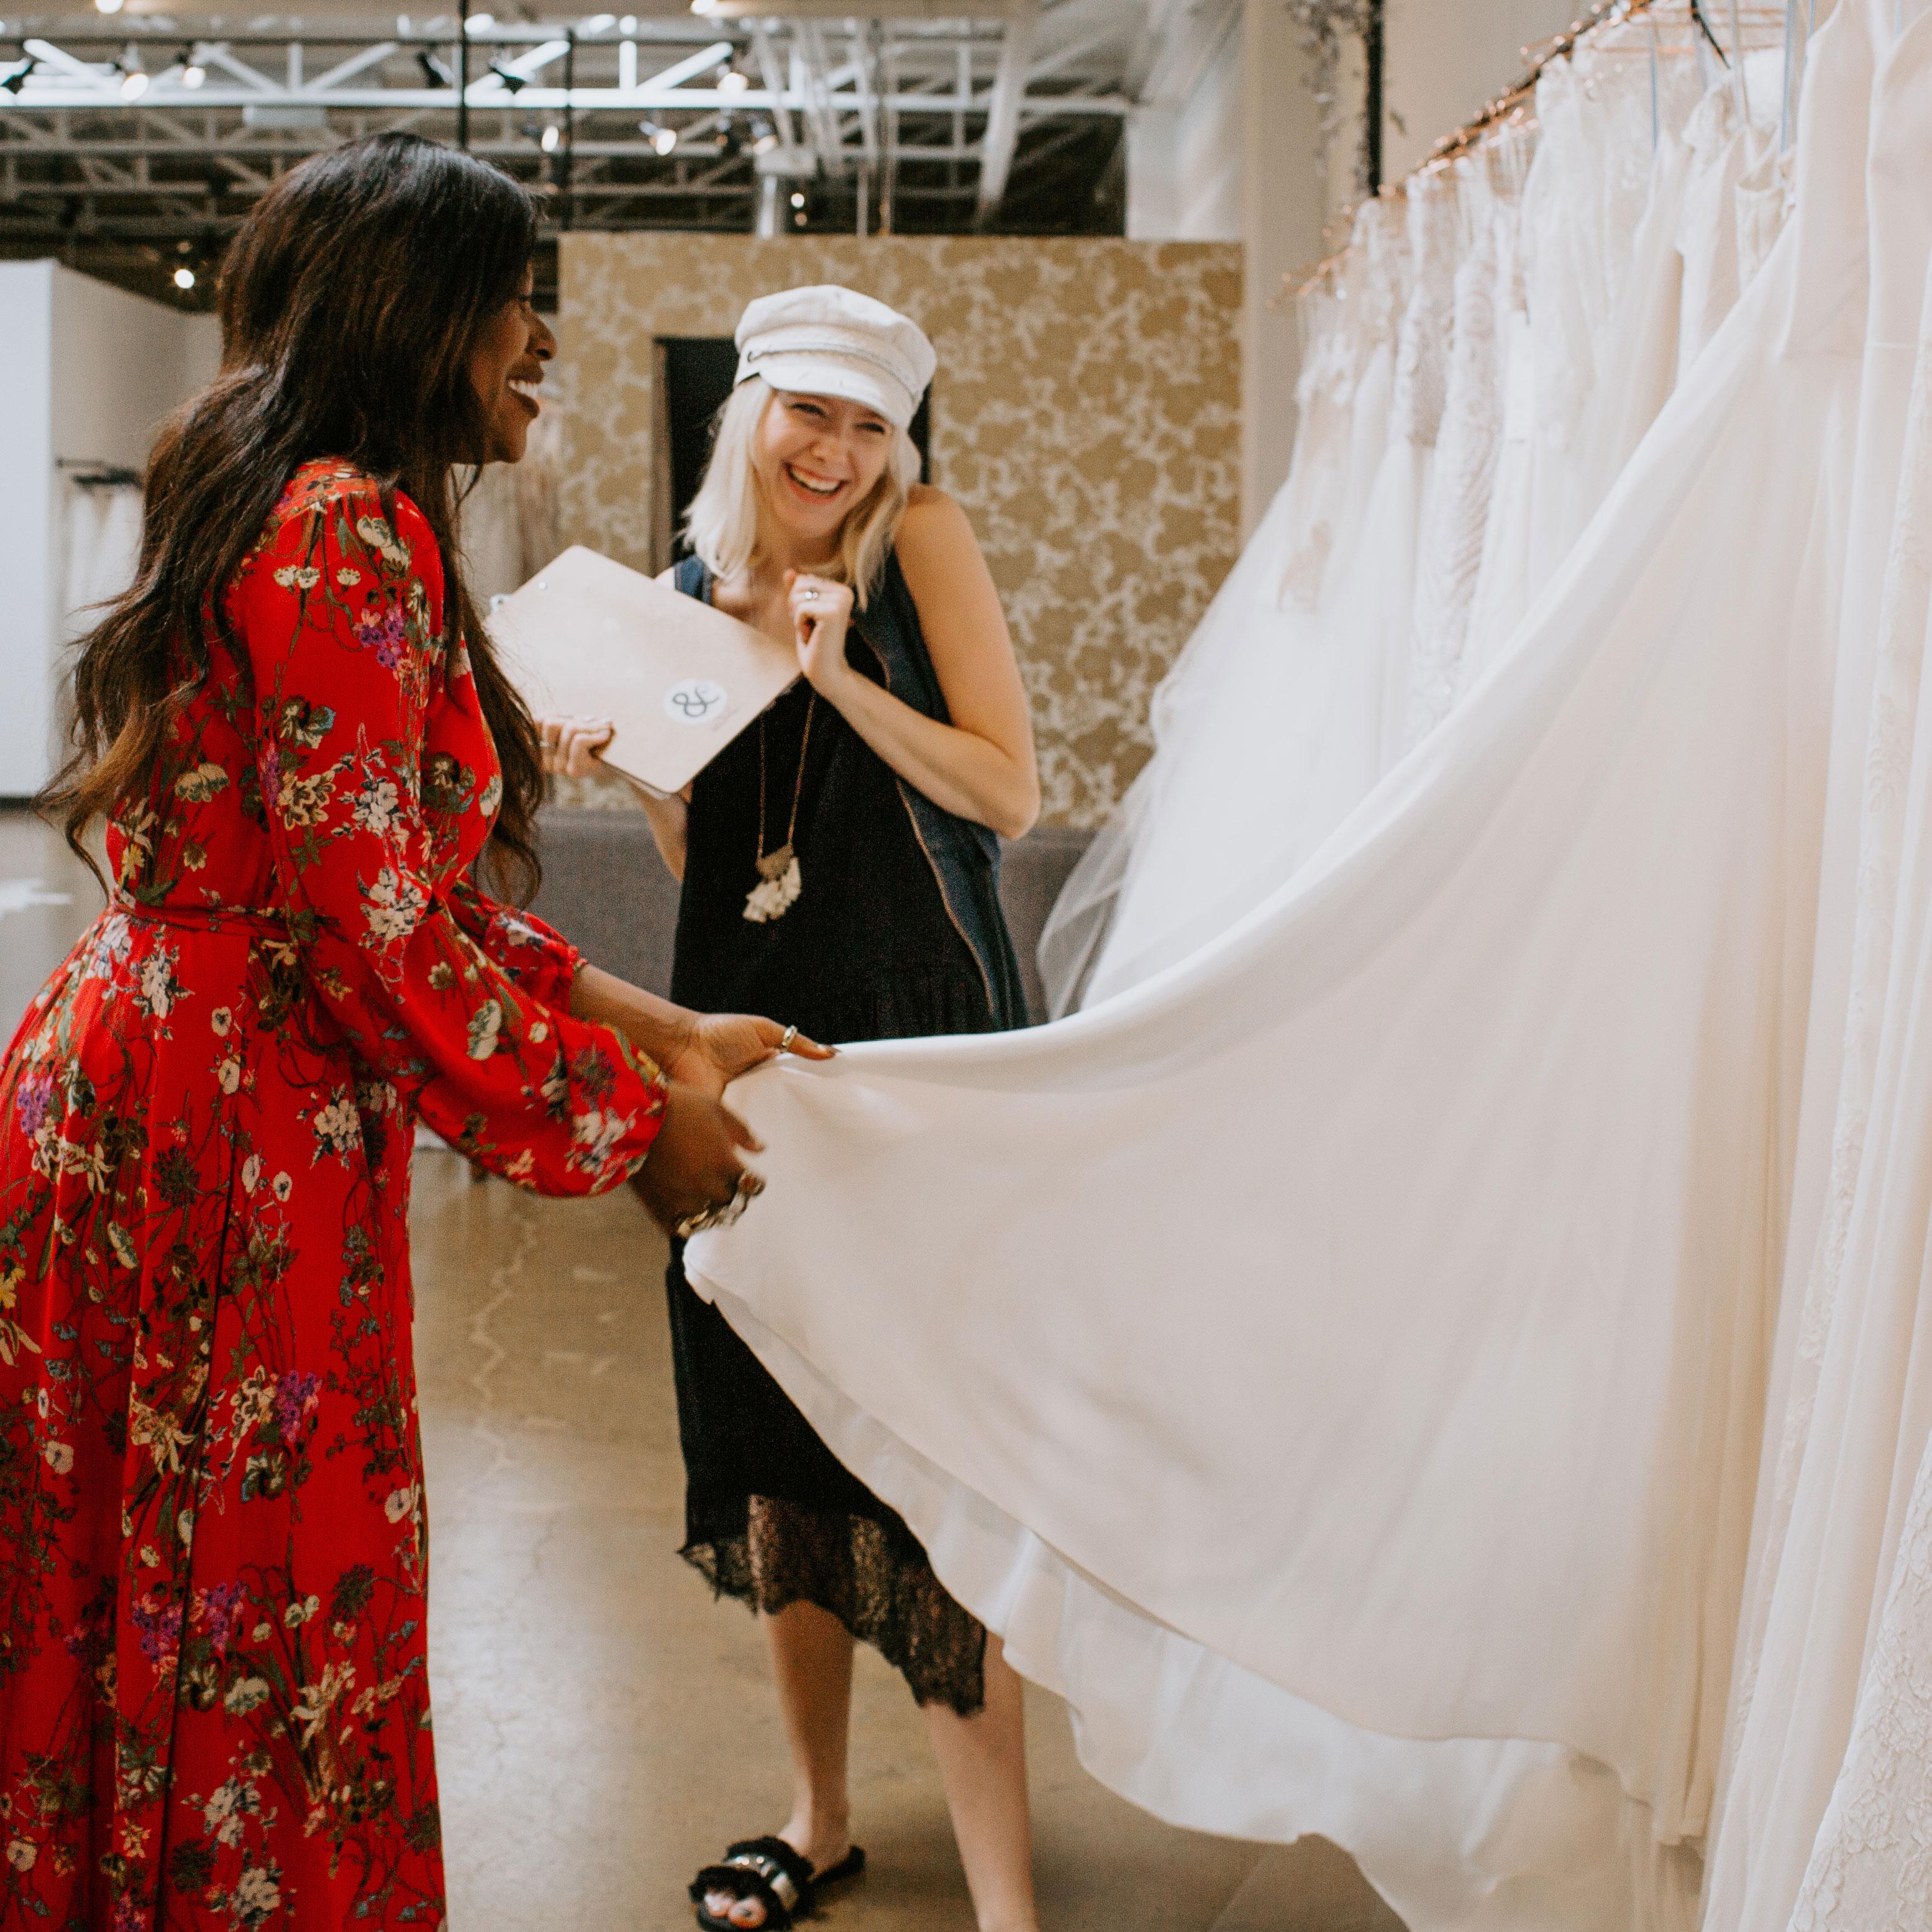 Karis Renee finding the perfect wedding dress